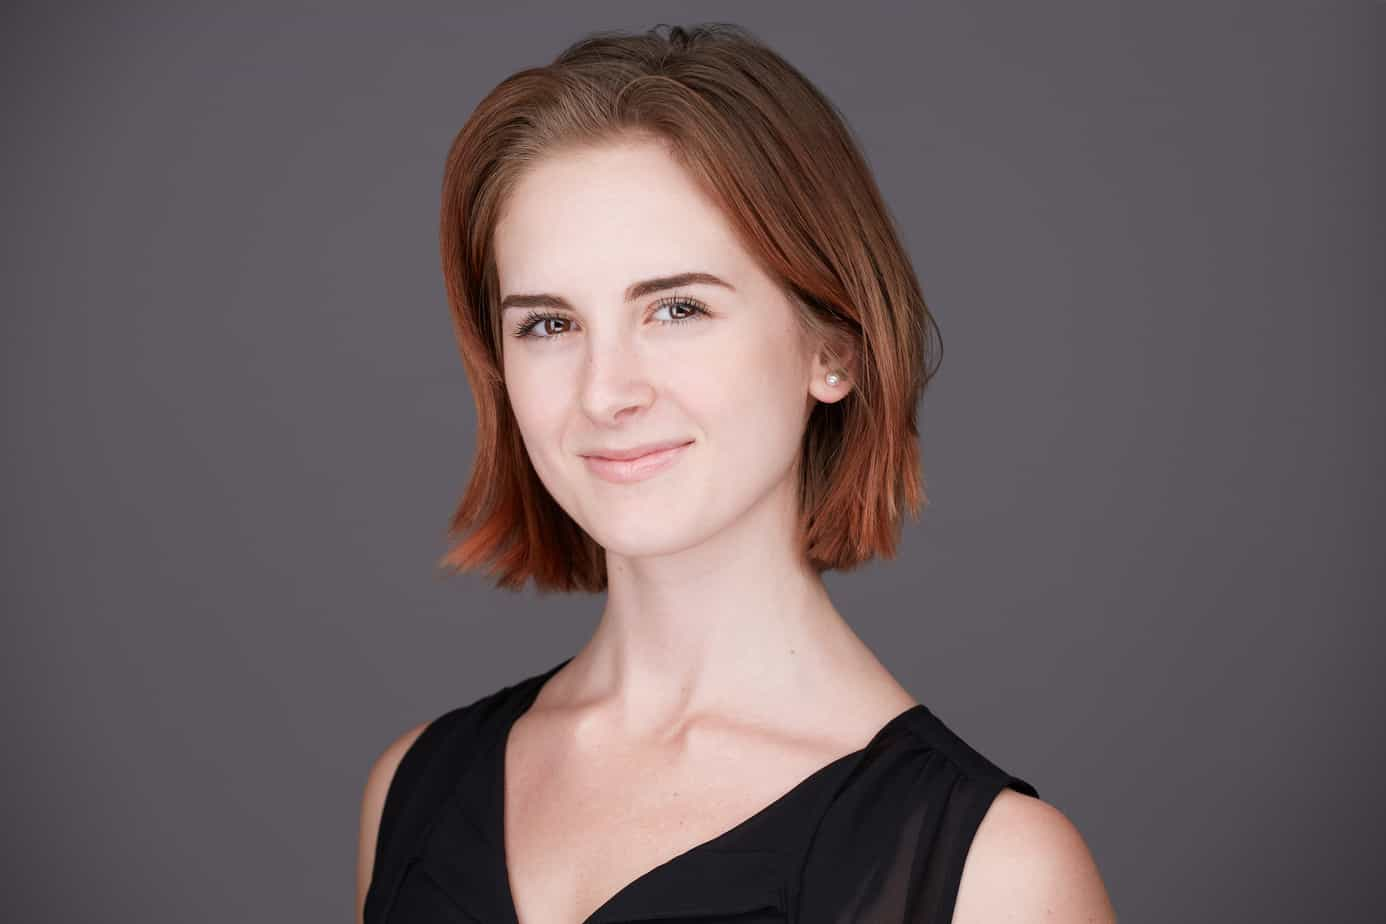 Emily Bosak